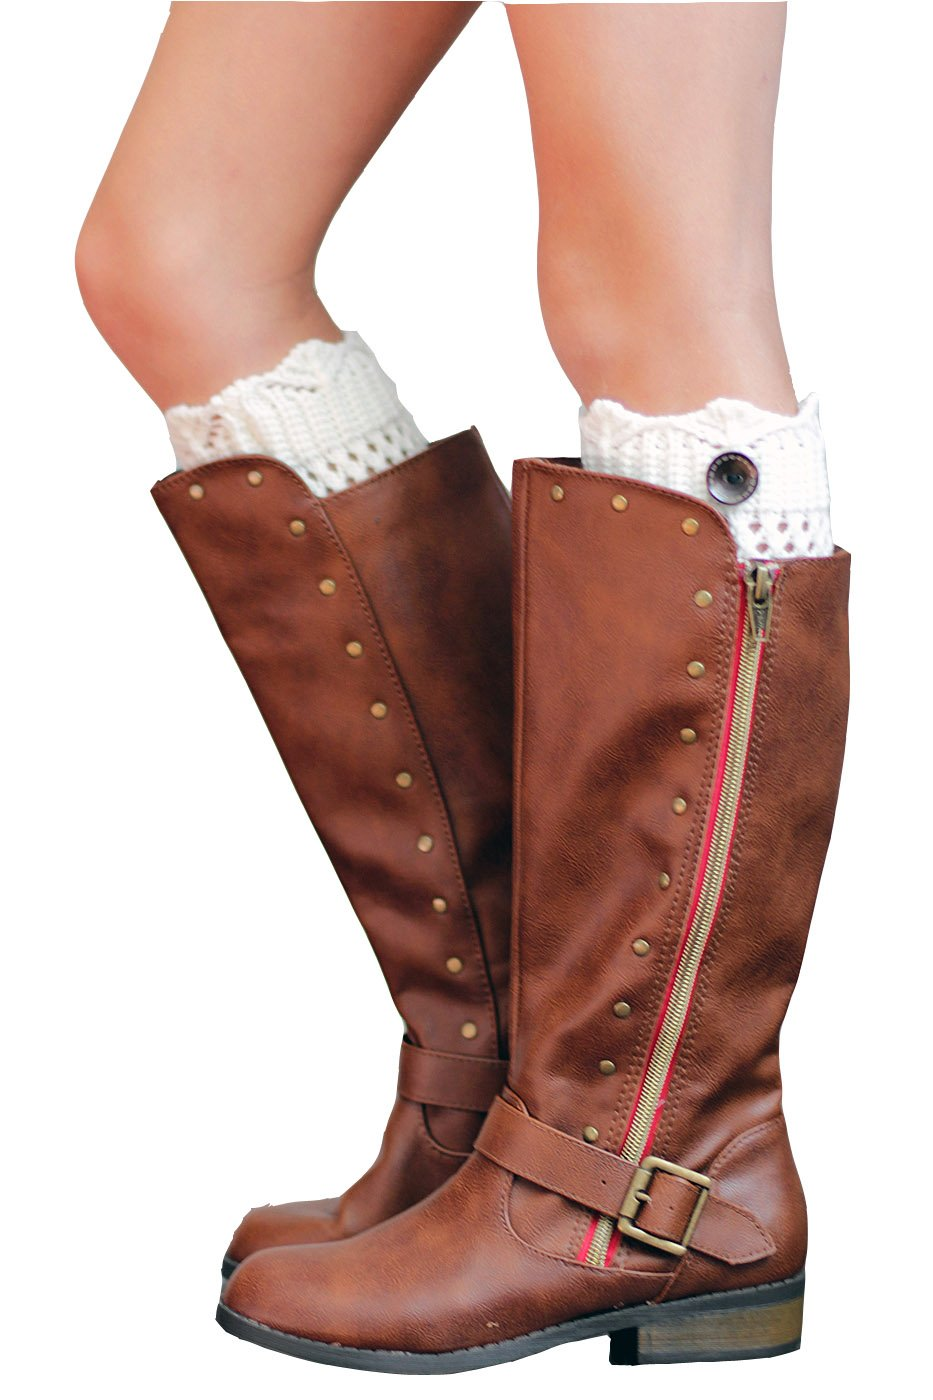 Girls Boot Cuffs 1 Button Knit Cuff for Kids by Modern Boho Ivory